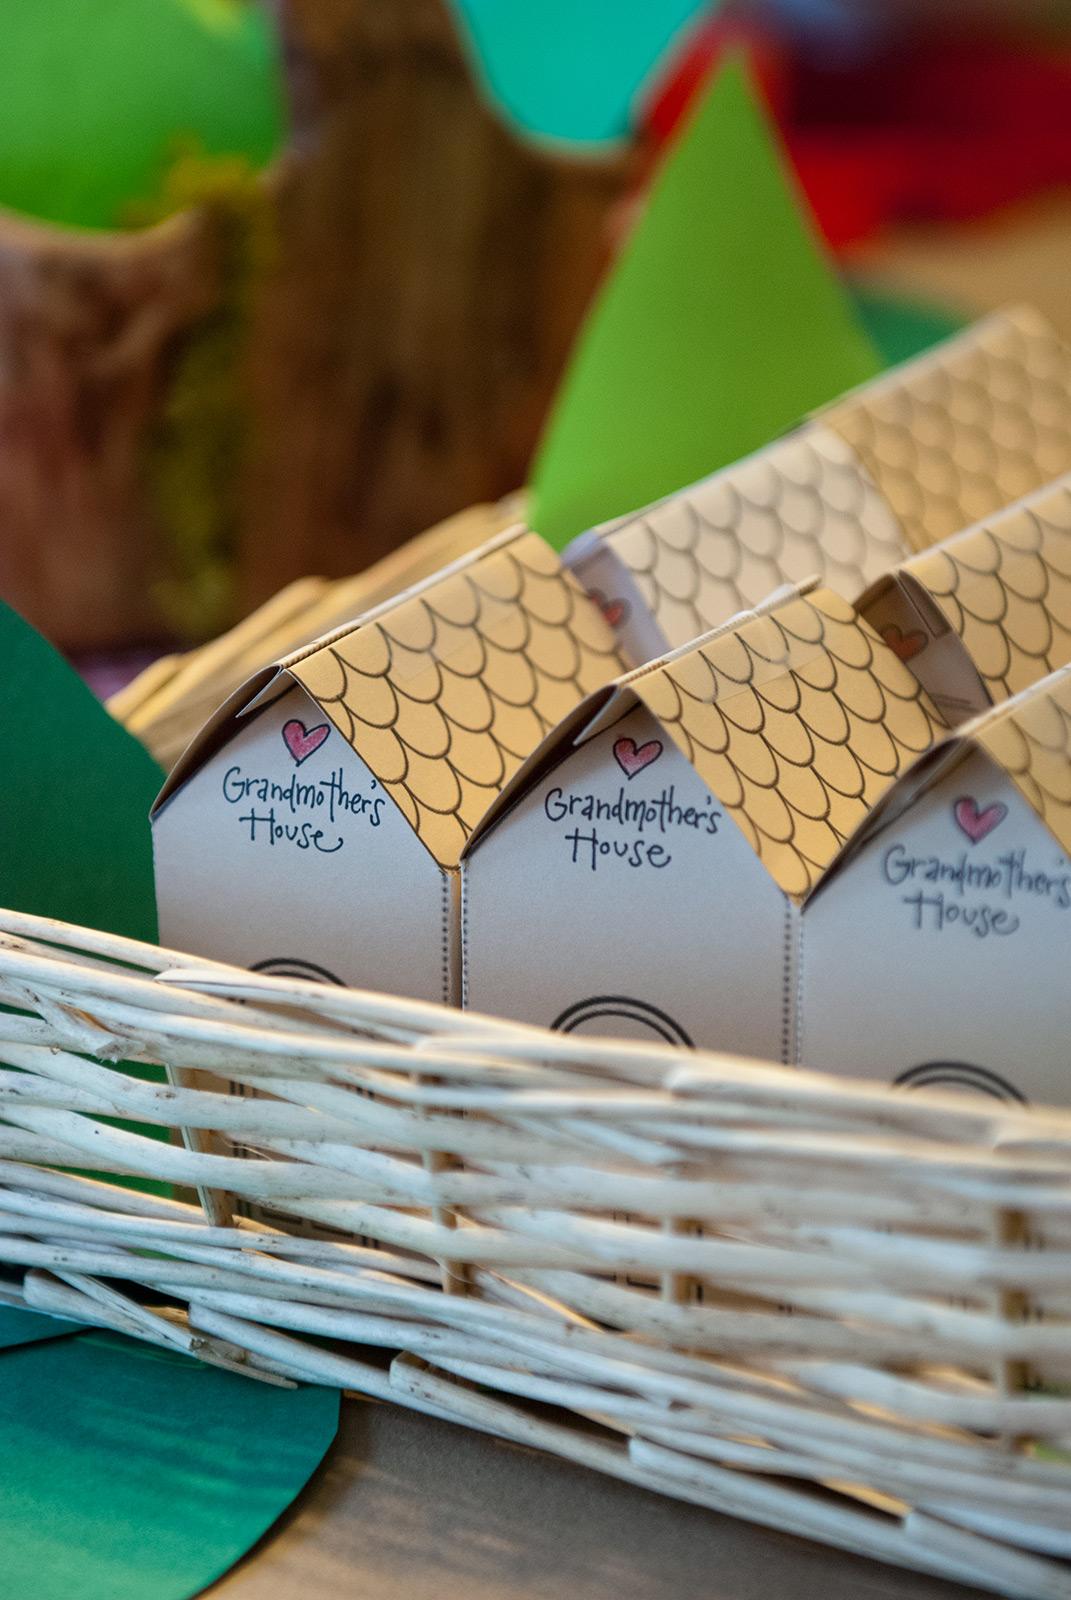 grandmothers-house-boxes.jpg